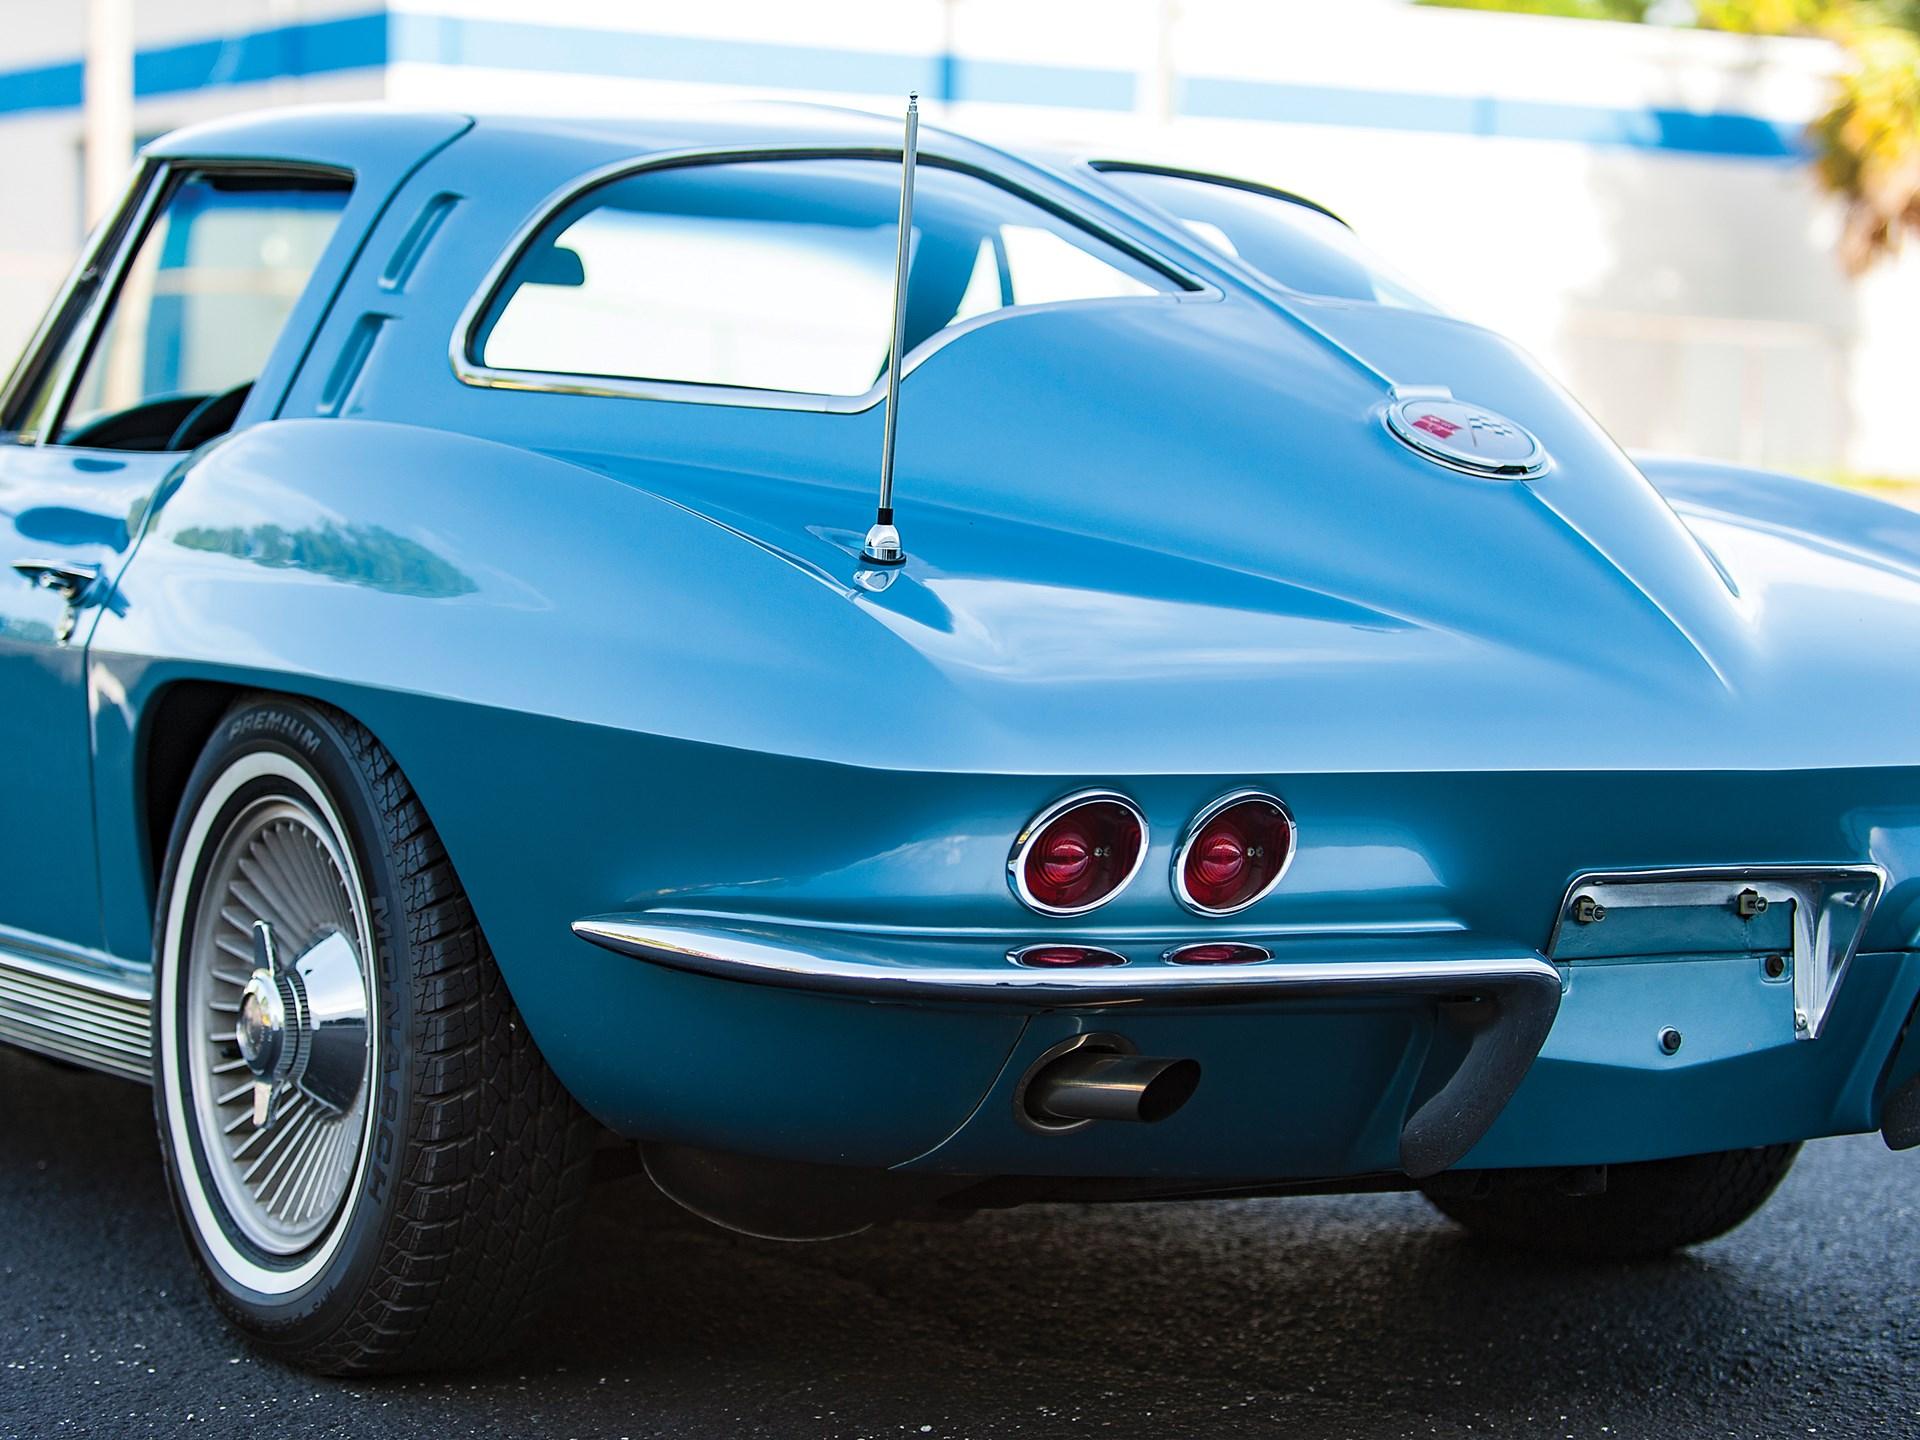 1963 Chevrolet Corvette Sting Ray 'Split-Window' Coupe